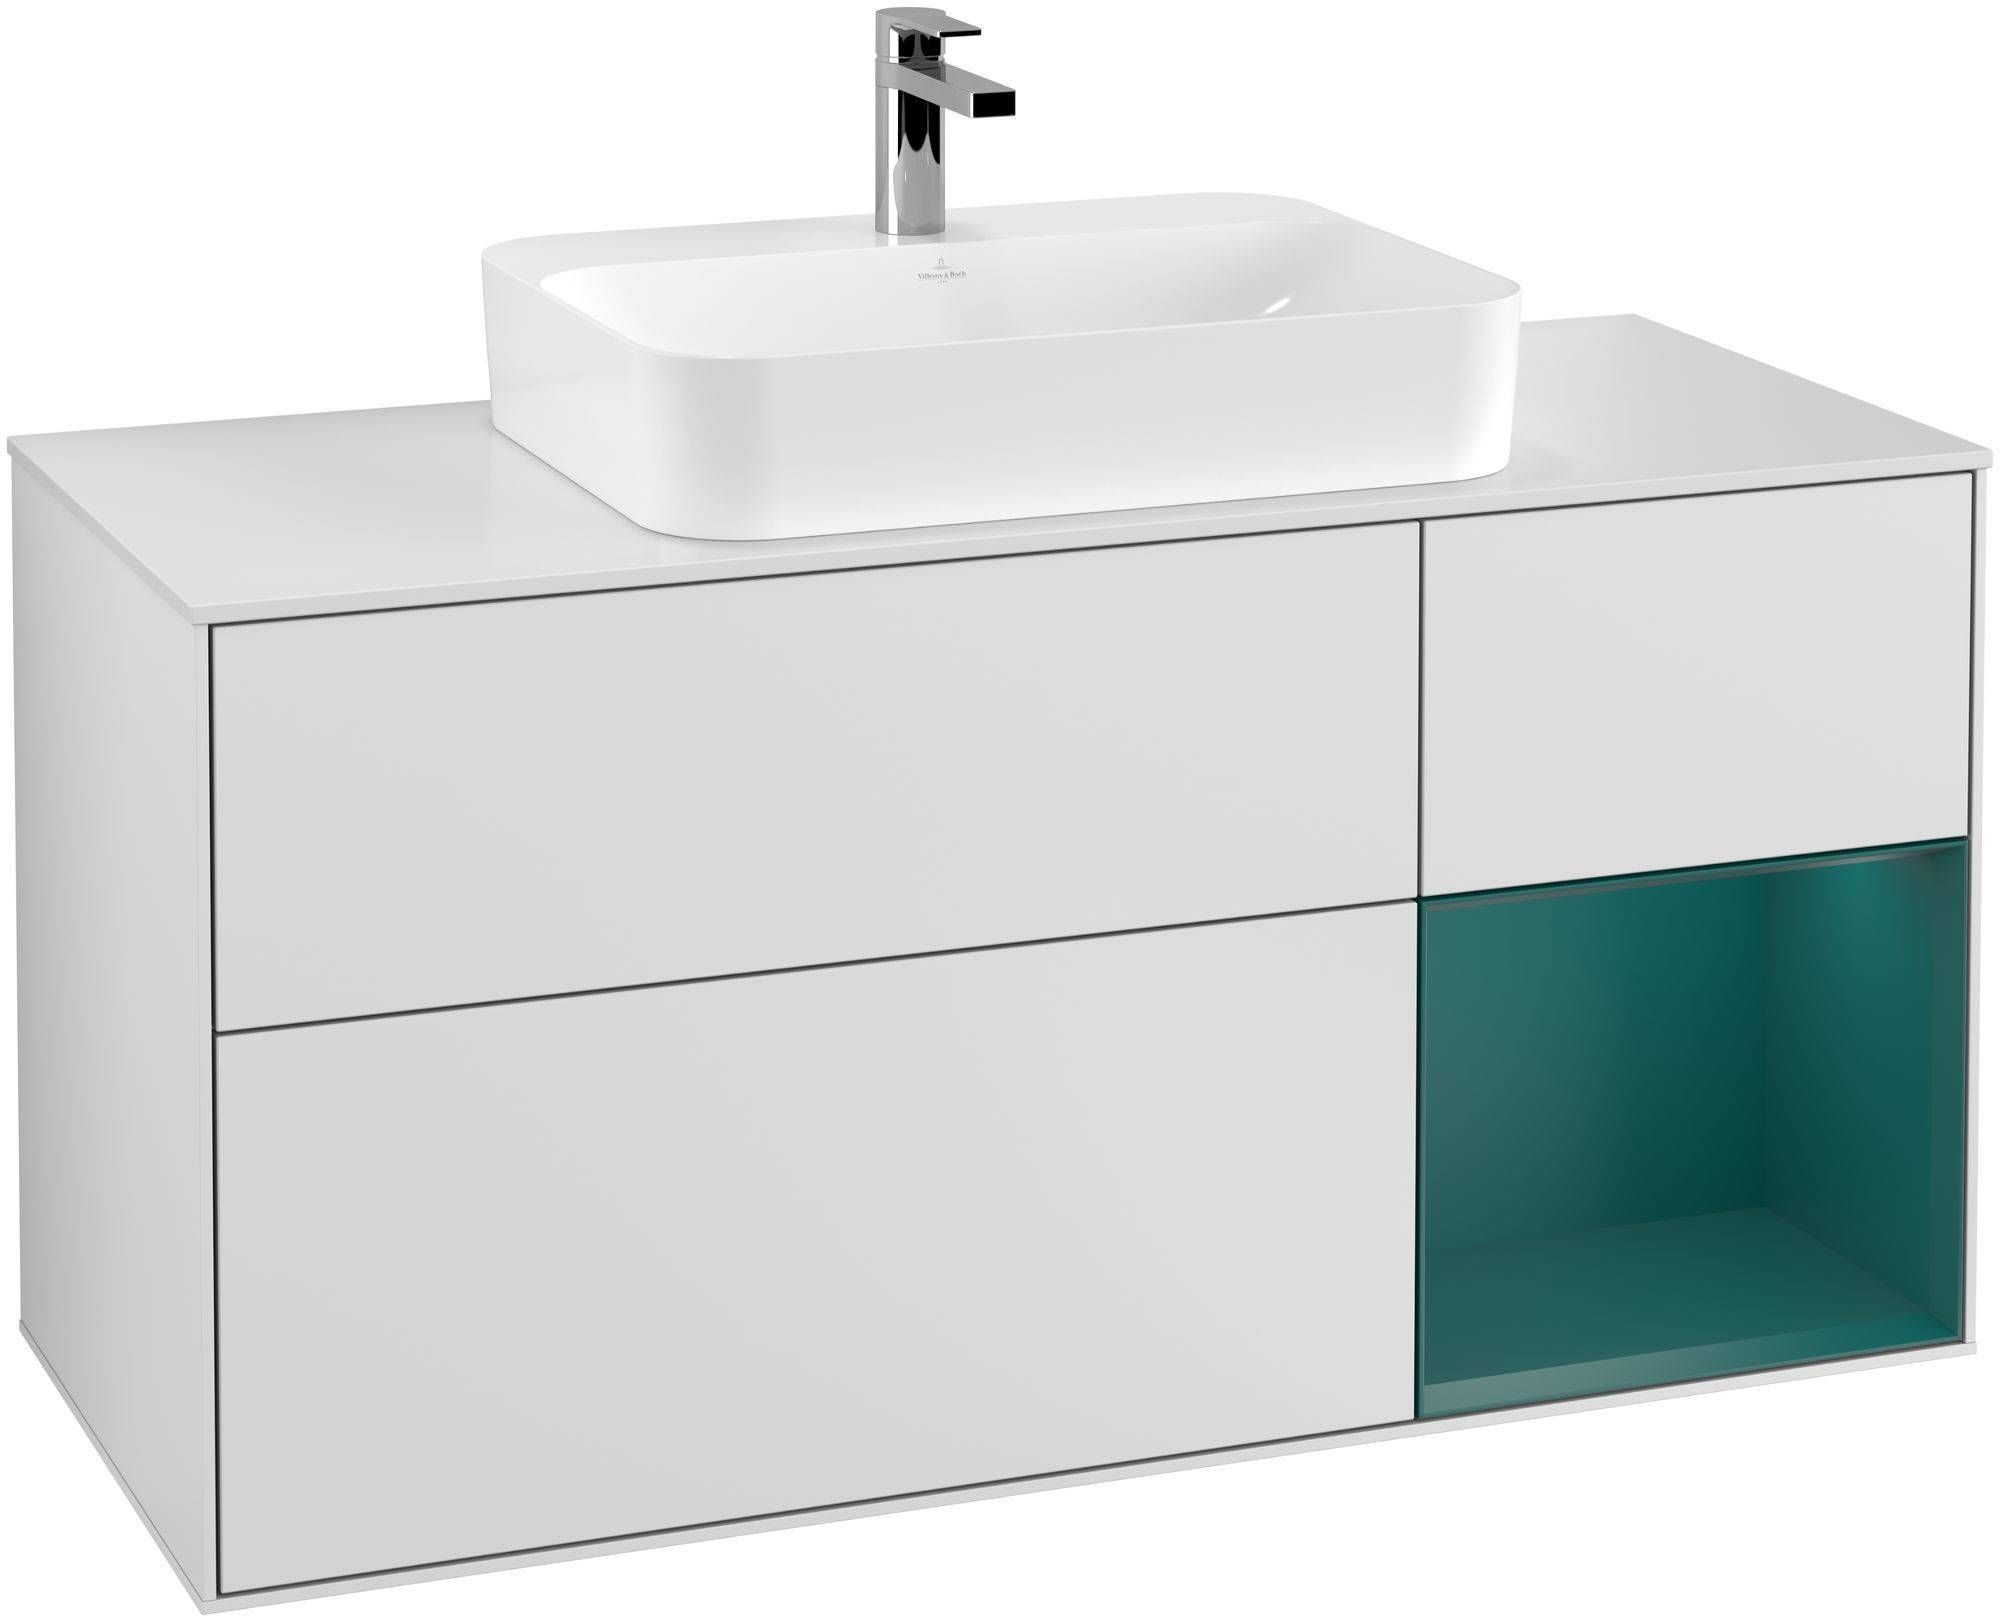 Villeroy & Boch Finion G42 Waschtischunterschrank mit Regalelement 3 Auszüge Waschtisch mittig LED-Beleuchtung B:120xH:60,3xT:50,1cm Front, Korpus: Weiß Matt Soft Grey, Regal: Cedar, Glasplatte: White Matt G421GSMT